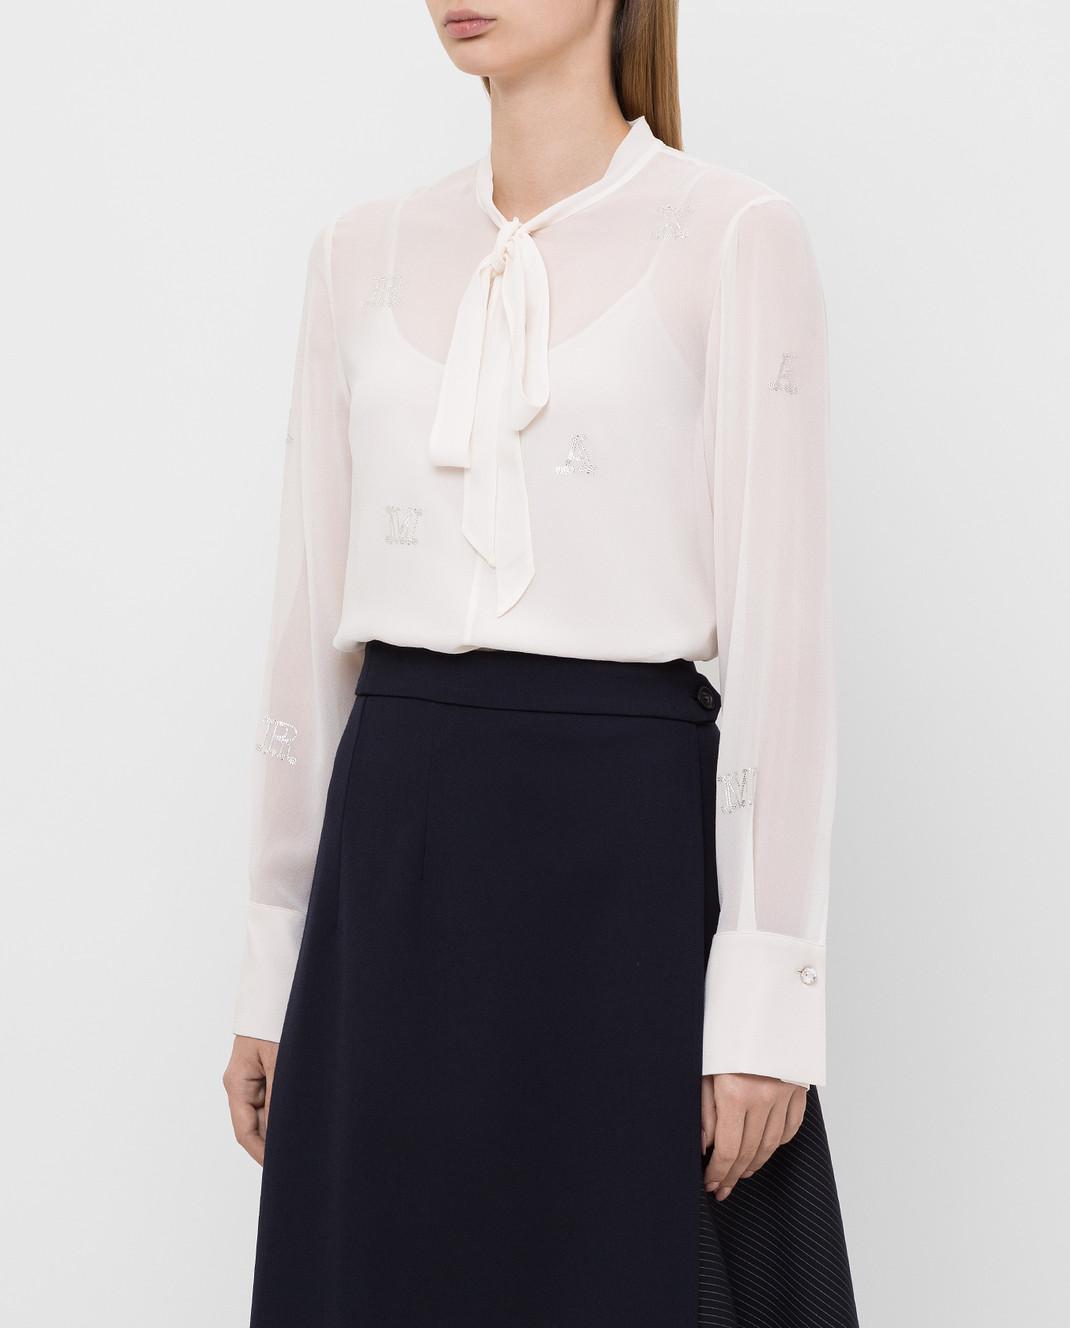 Max Mara Светло-бежевая блуза из шелка изображение 3